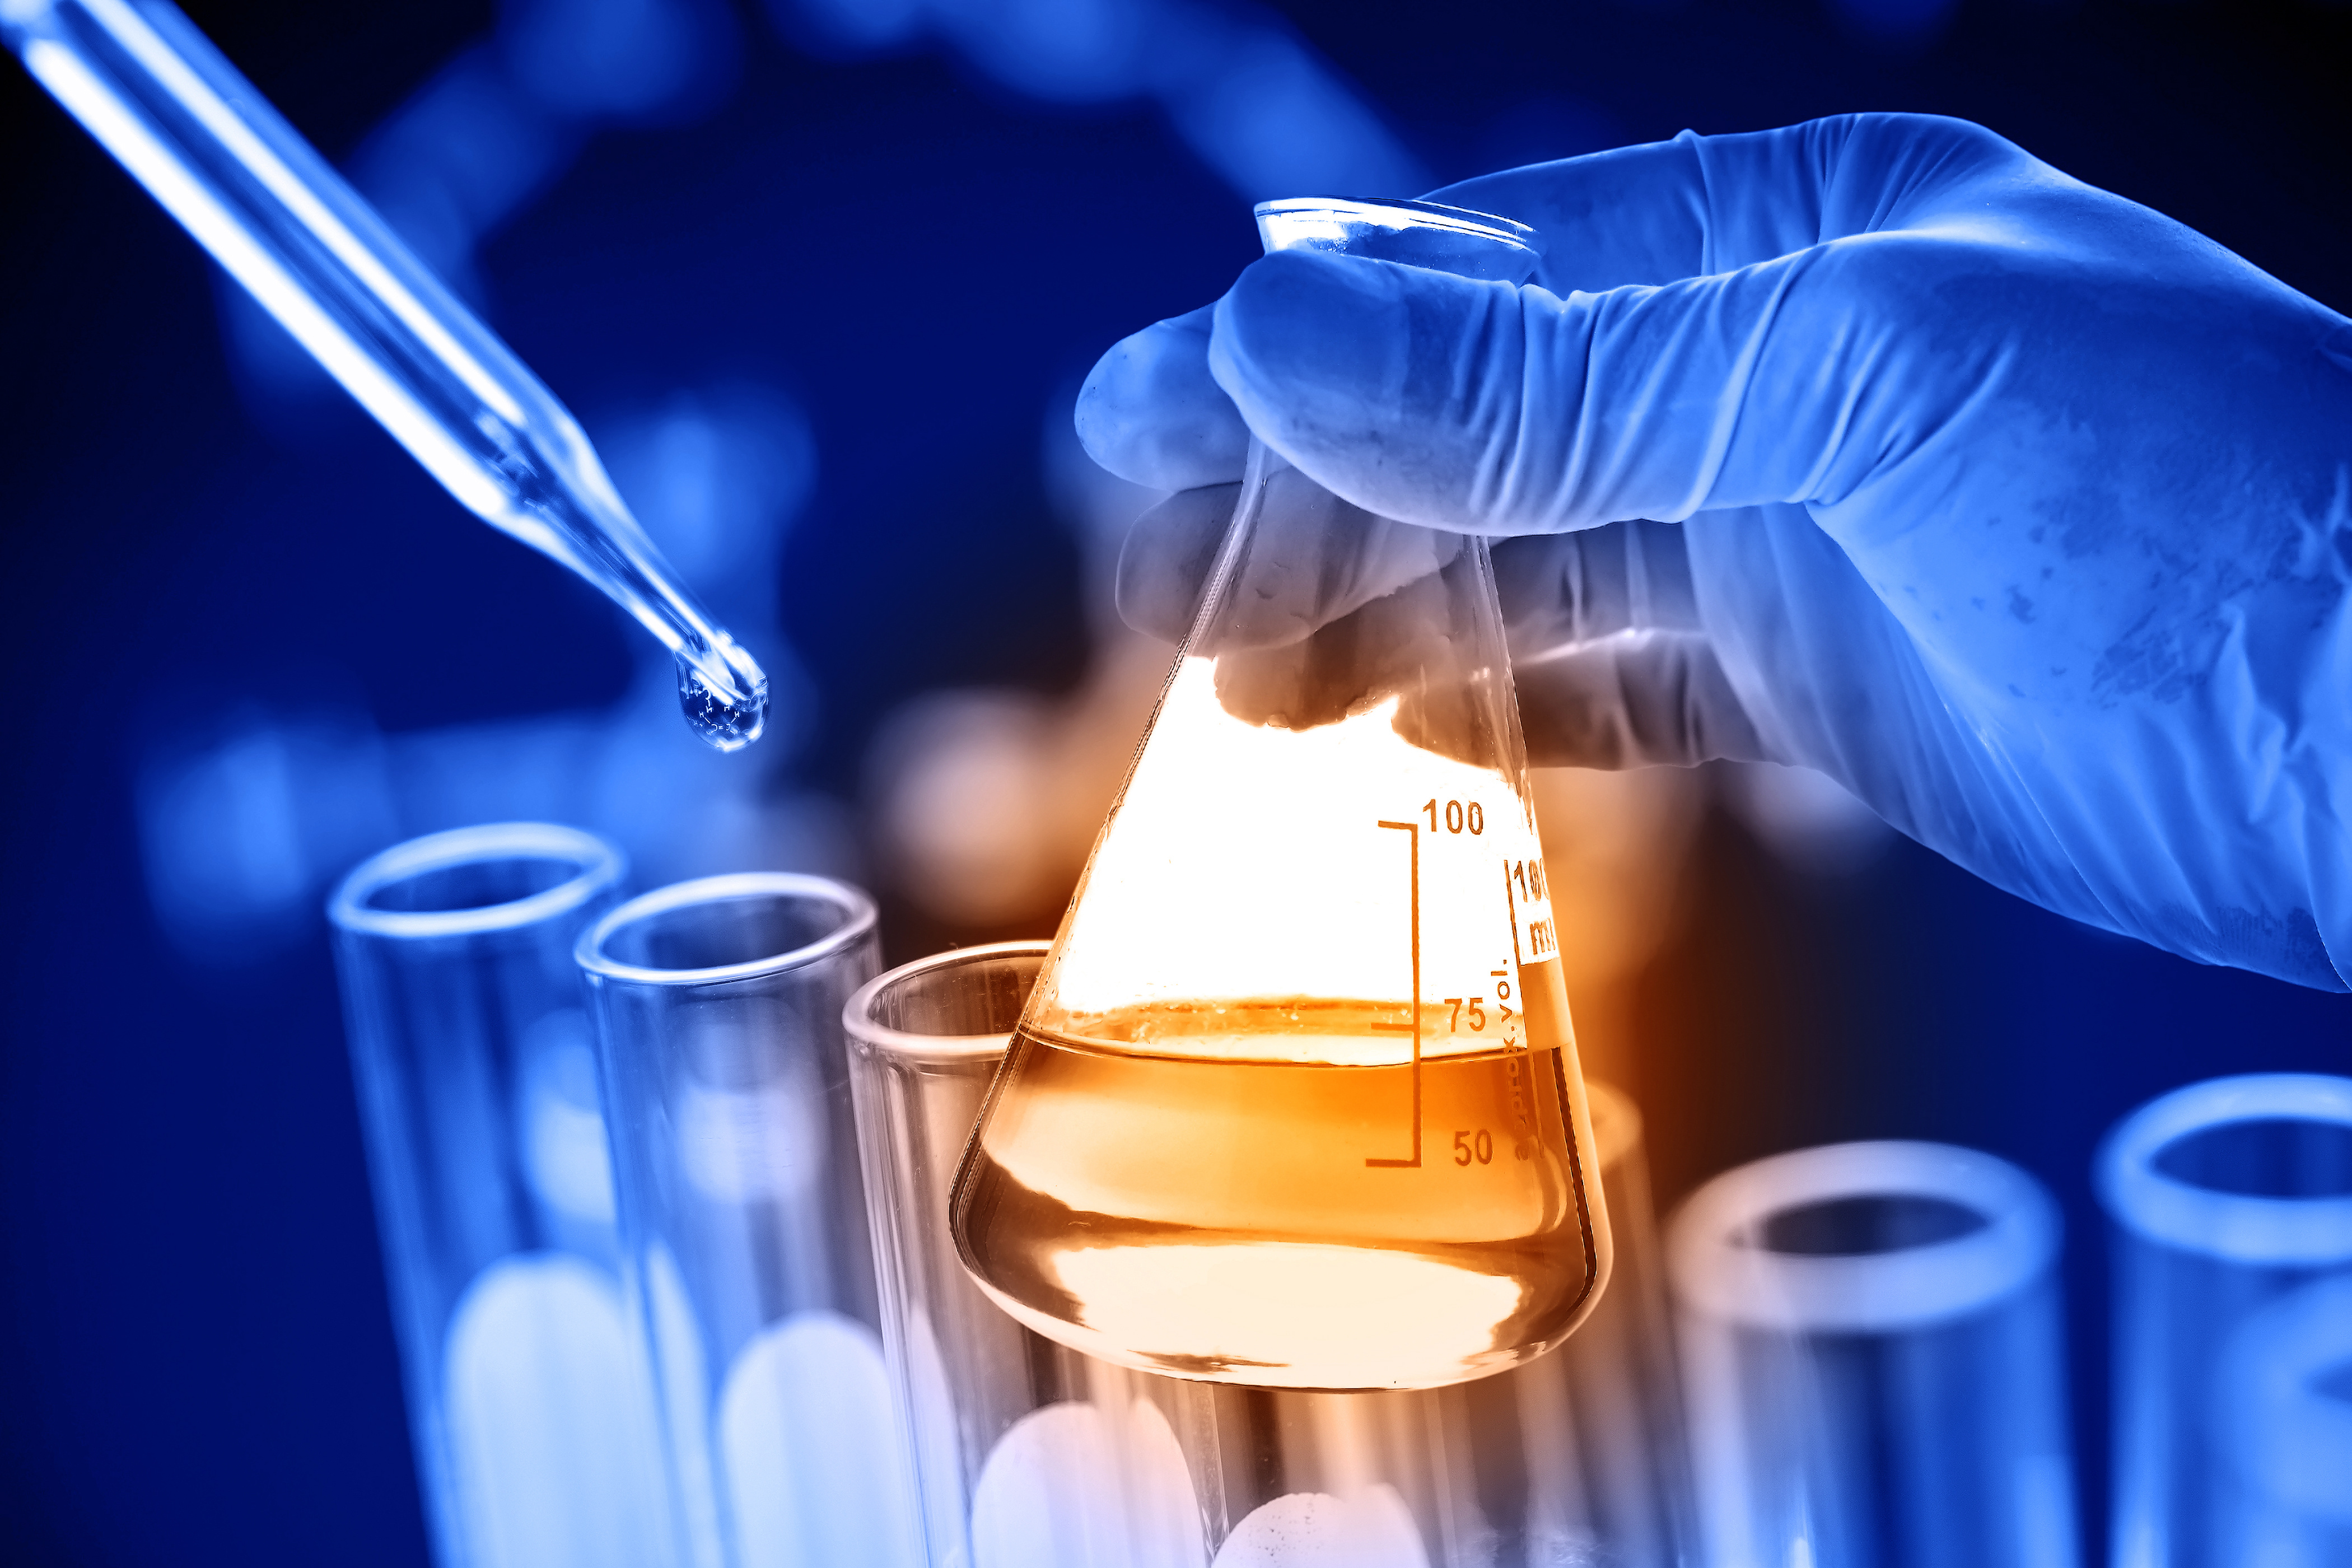 image of a laboratory beaker